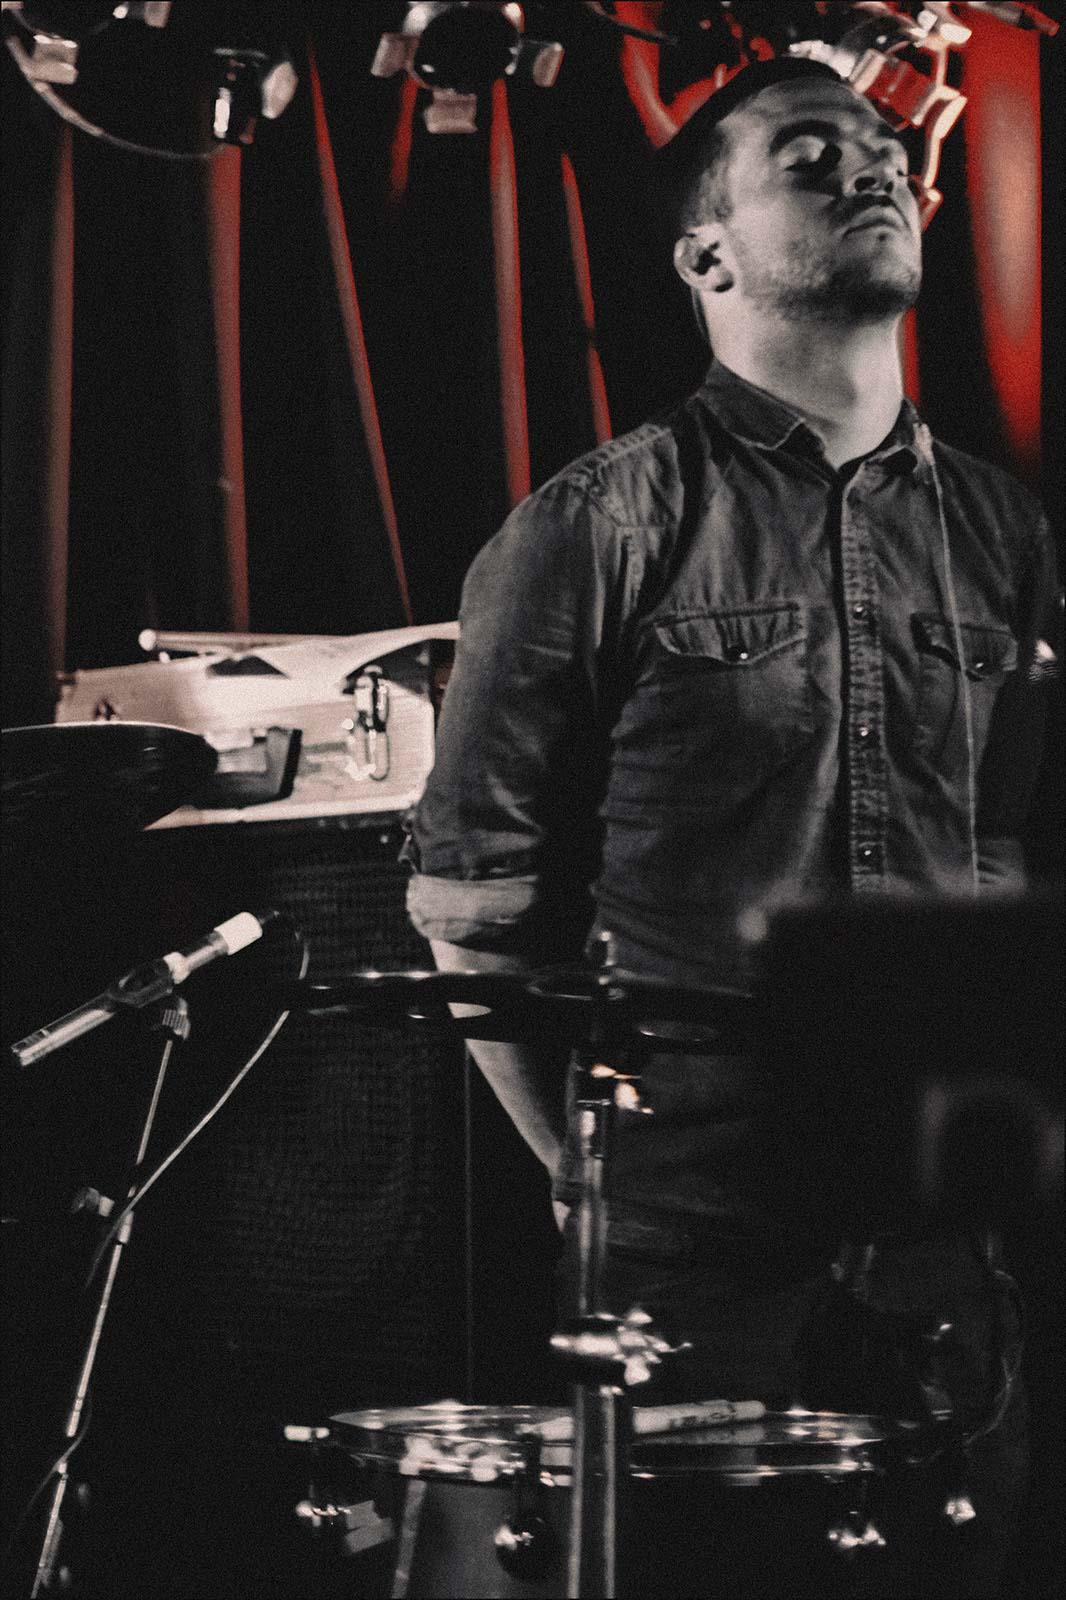 come_on_live_long_album_launch_whelans_dublin011.jpg